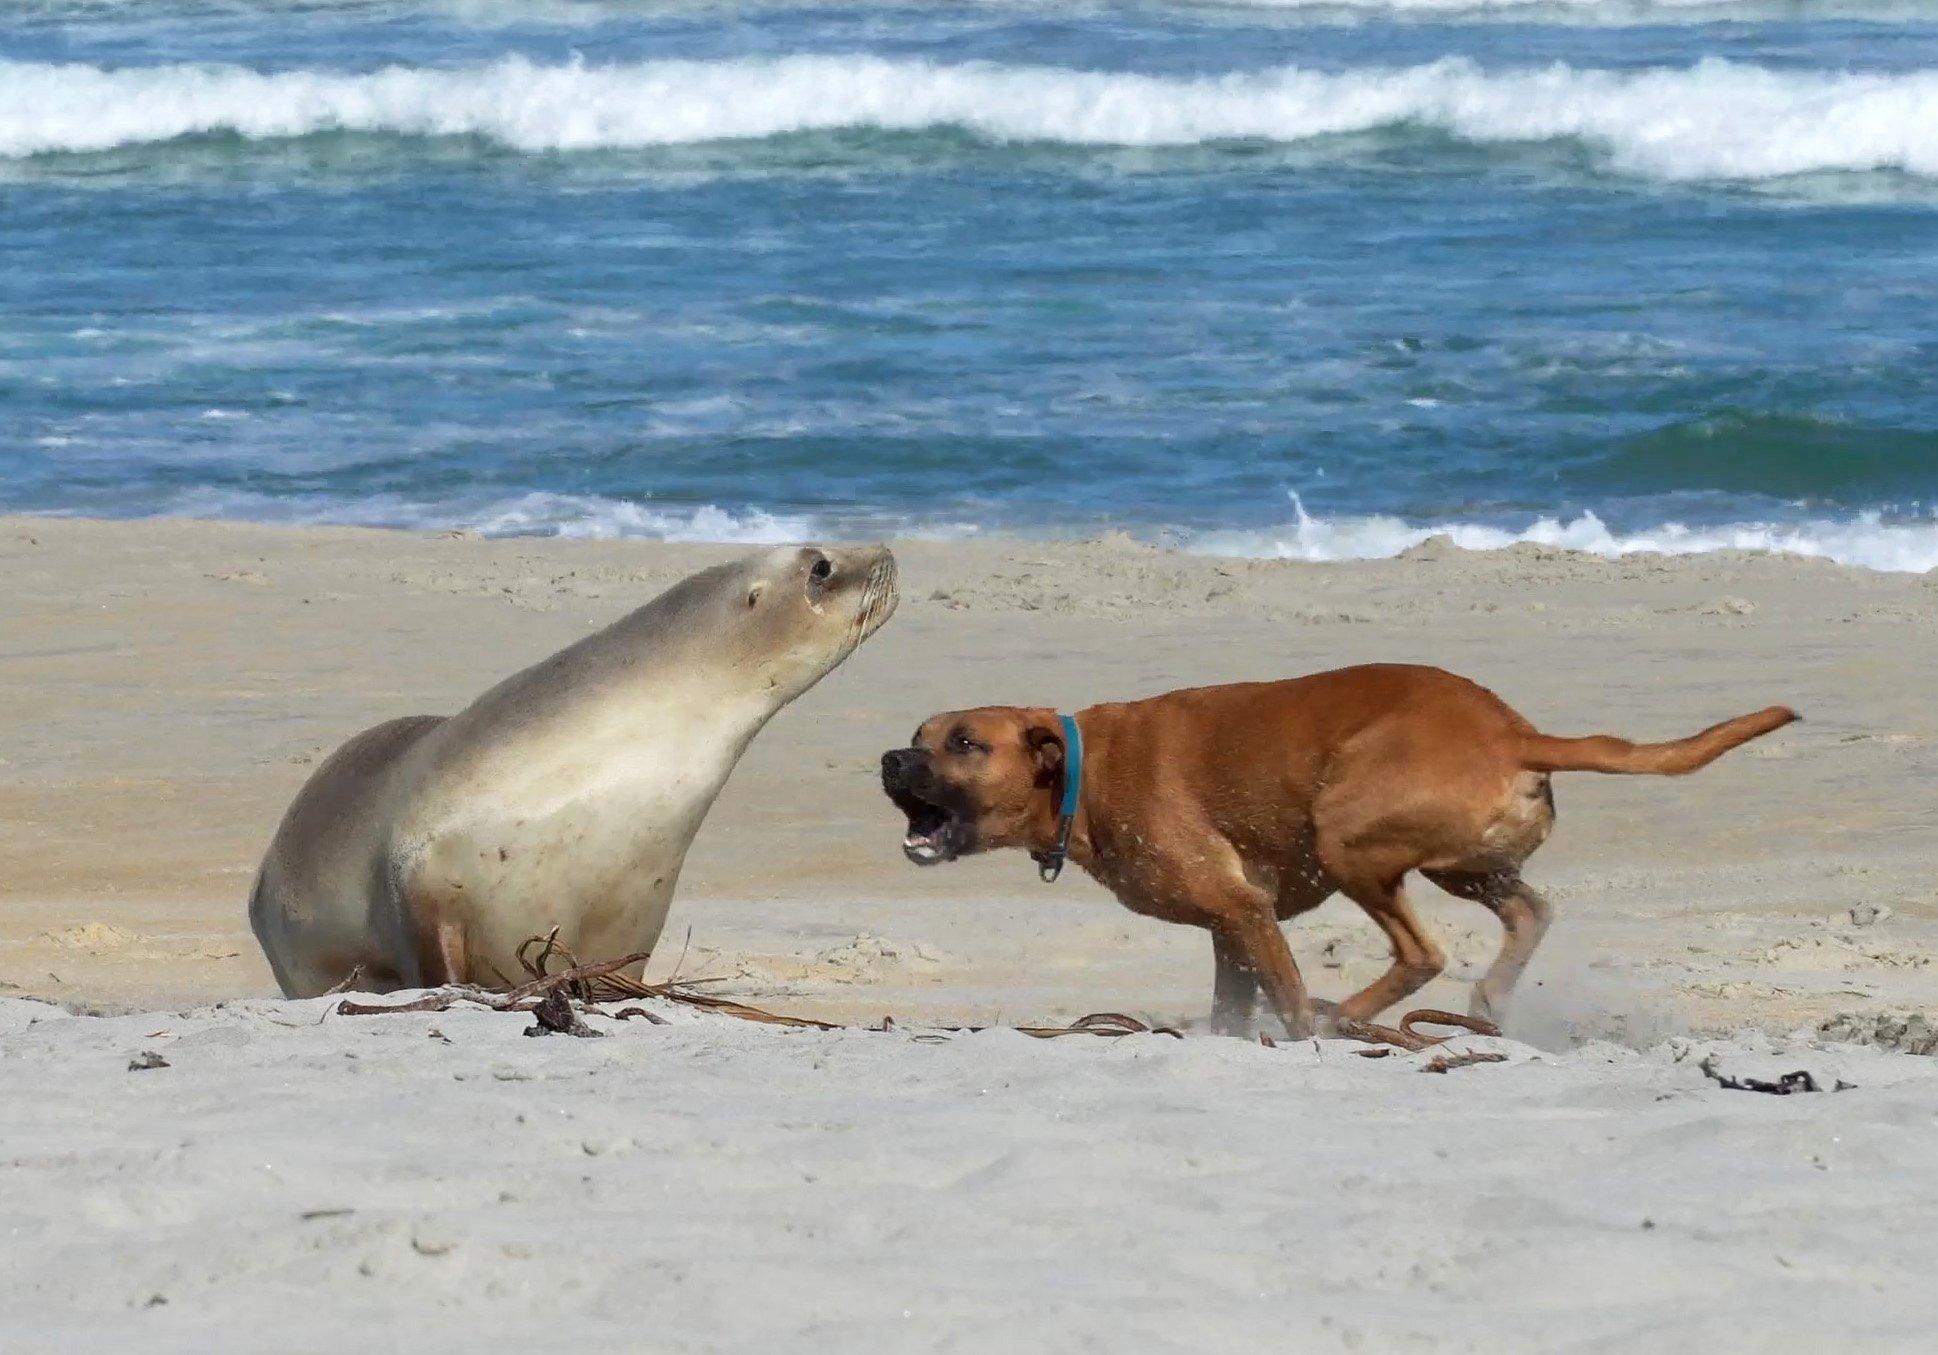 A dog off its leash disturbs a sea lion resting on Smaills Beach, in Dunedin, last week. PHOTO:...